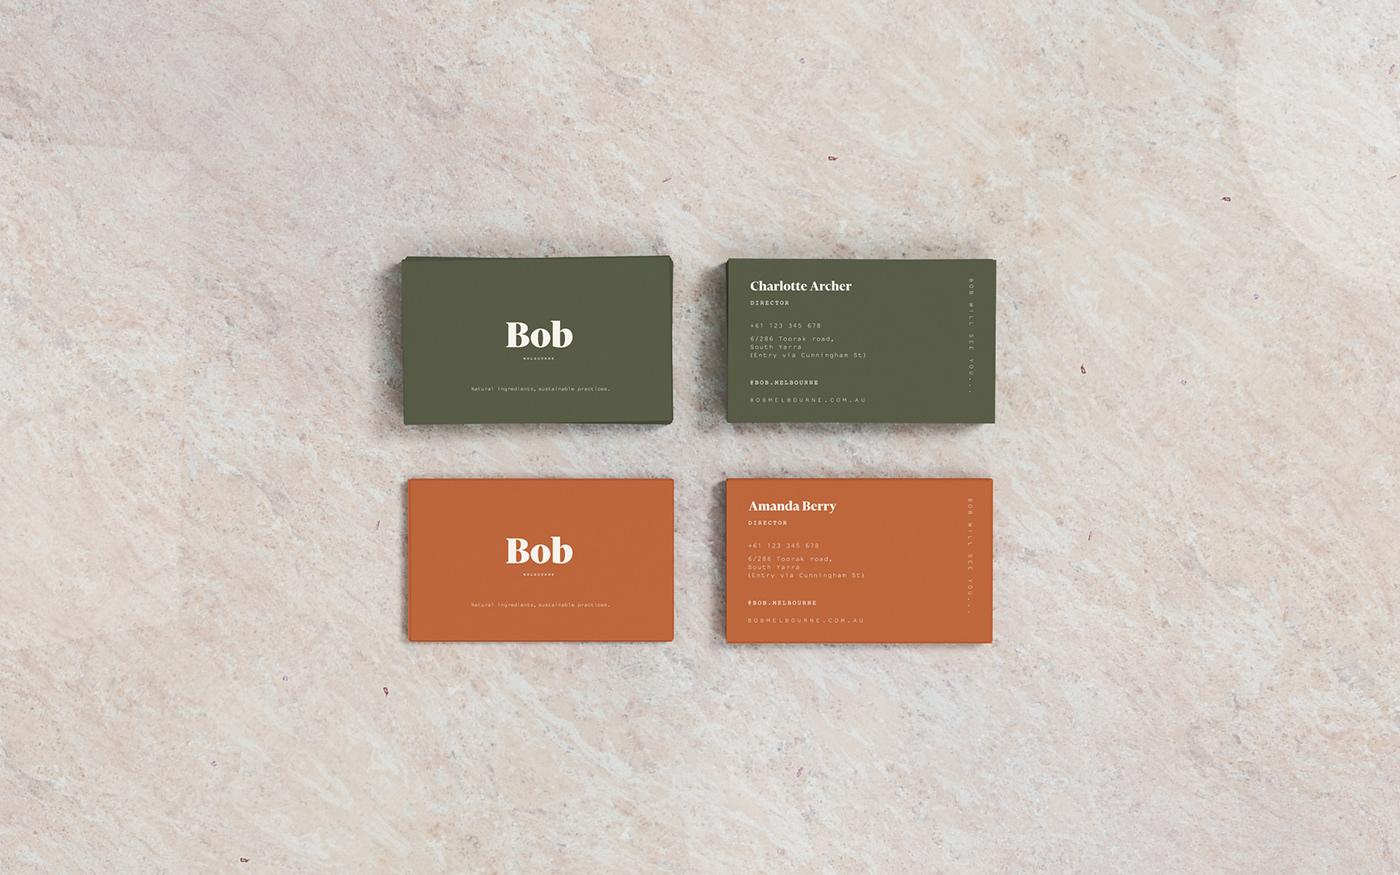 Bob Melbourne branding  nicole miller-wong graphic design  auckland New Zealand art direction  print design